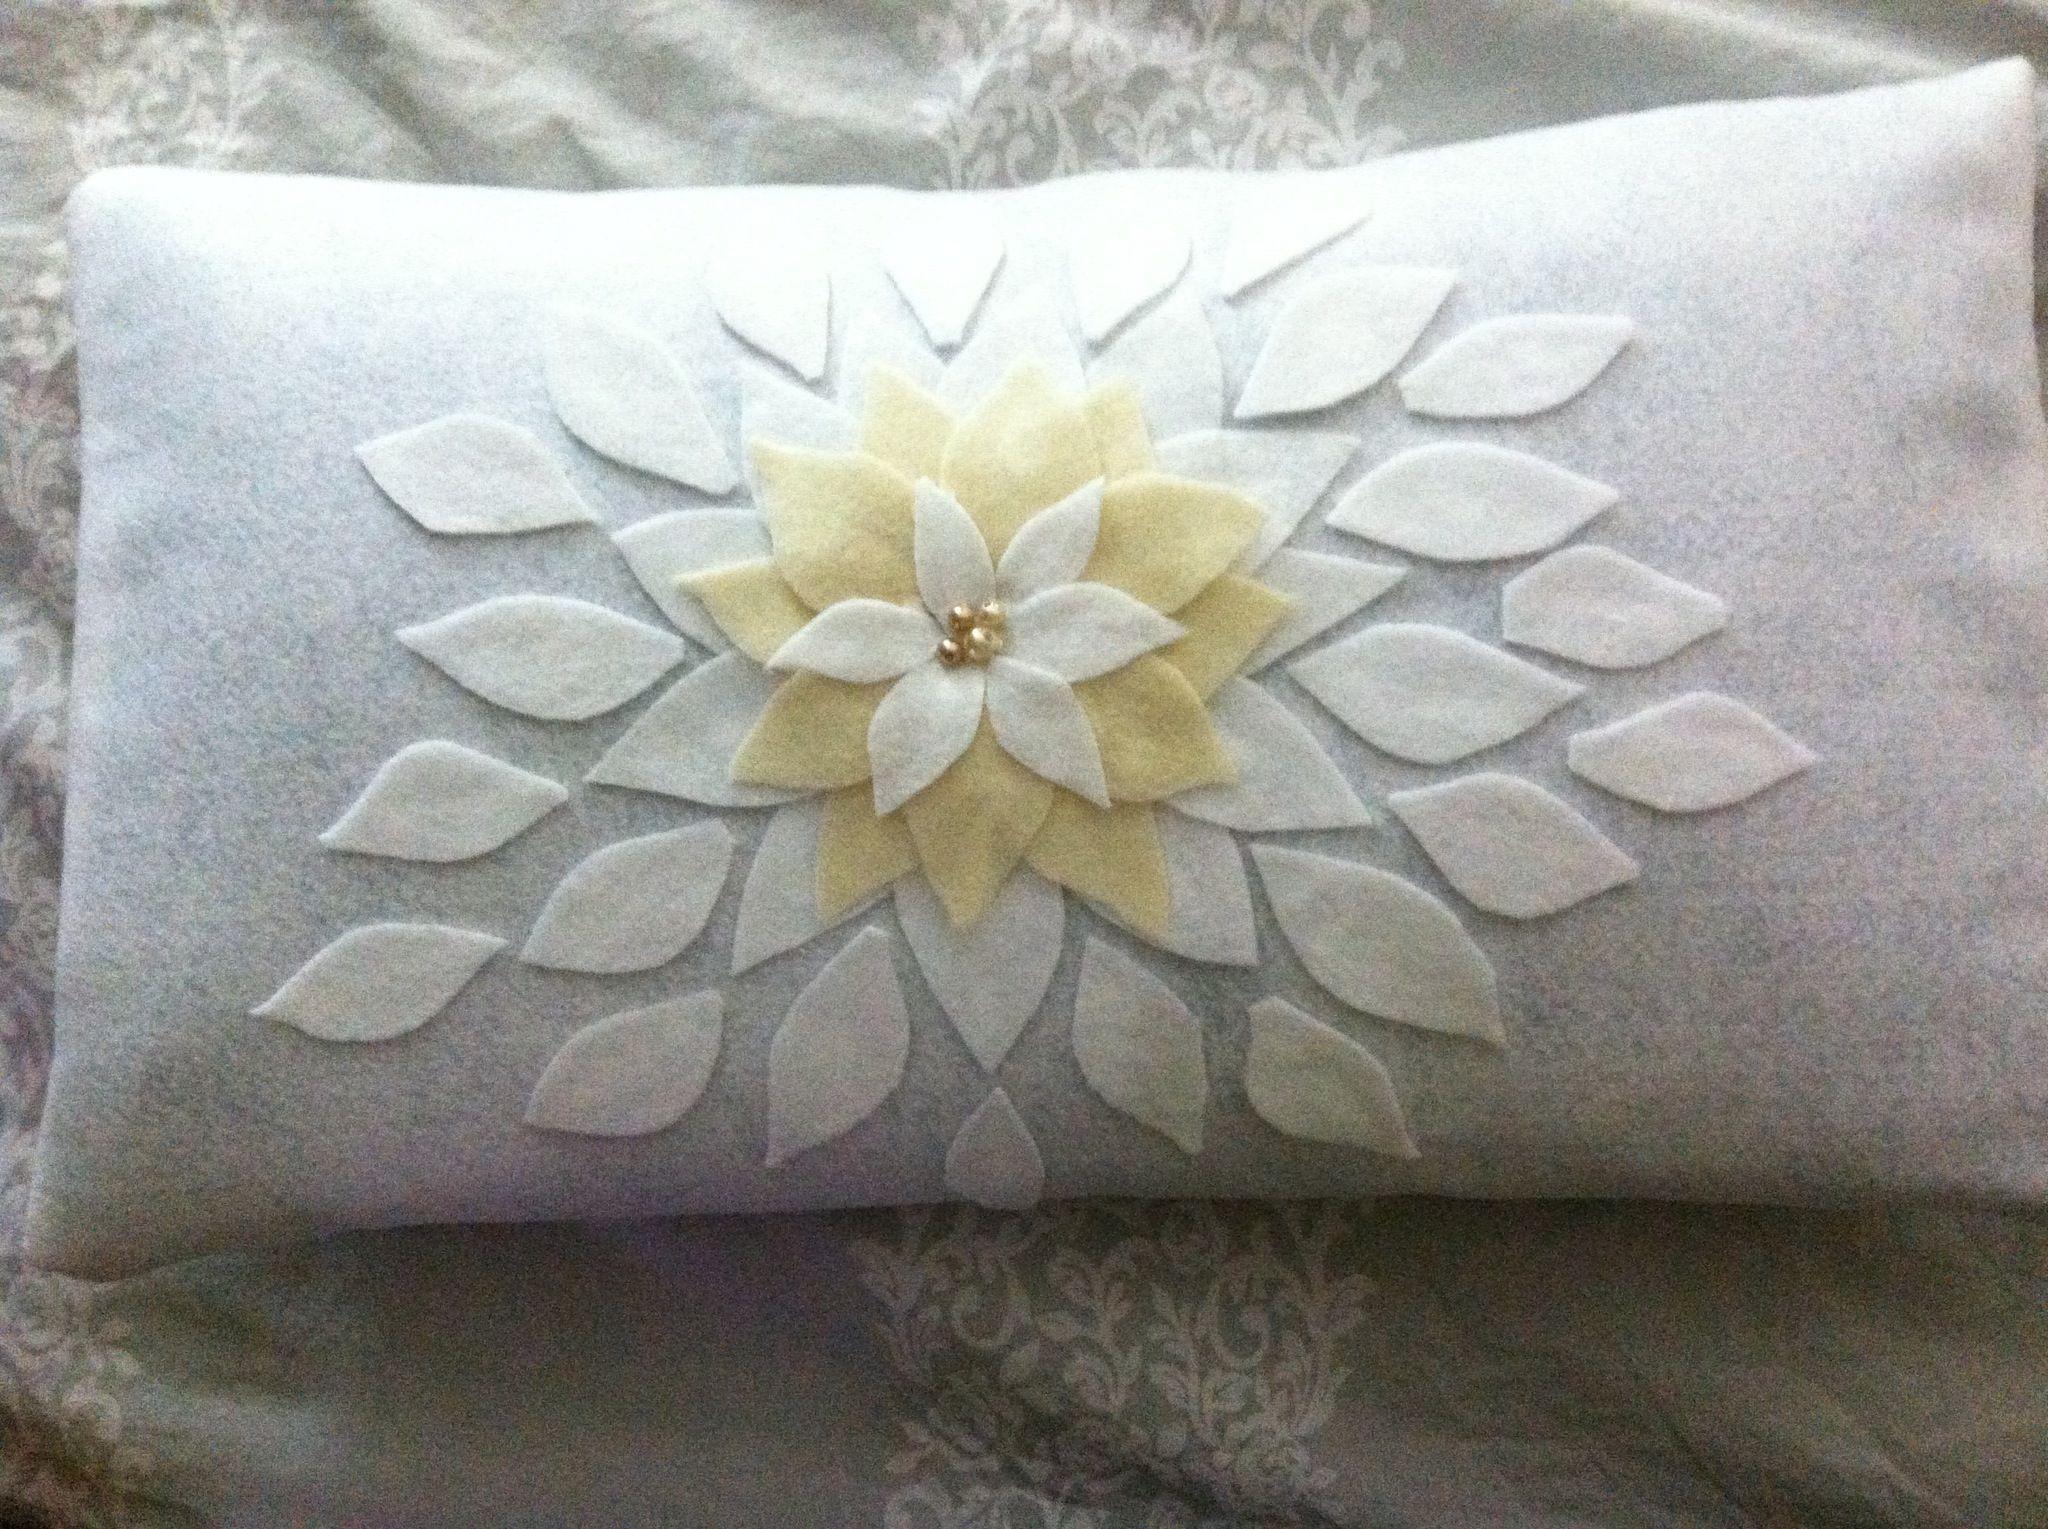 DIY felt cushion cover with poinsettias. Crafts I made ...